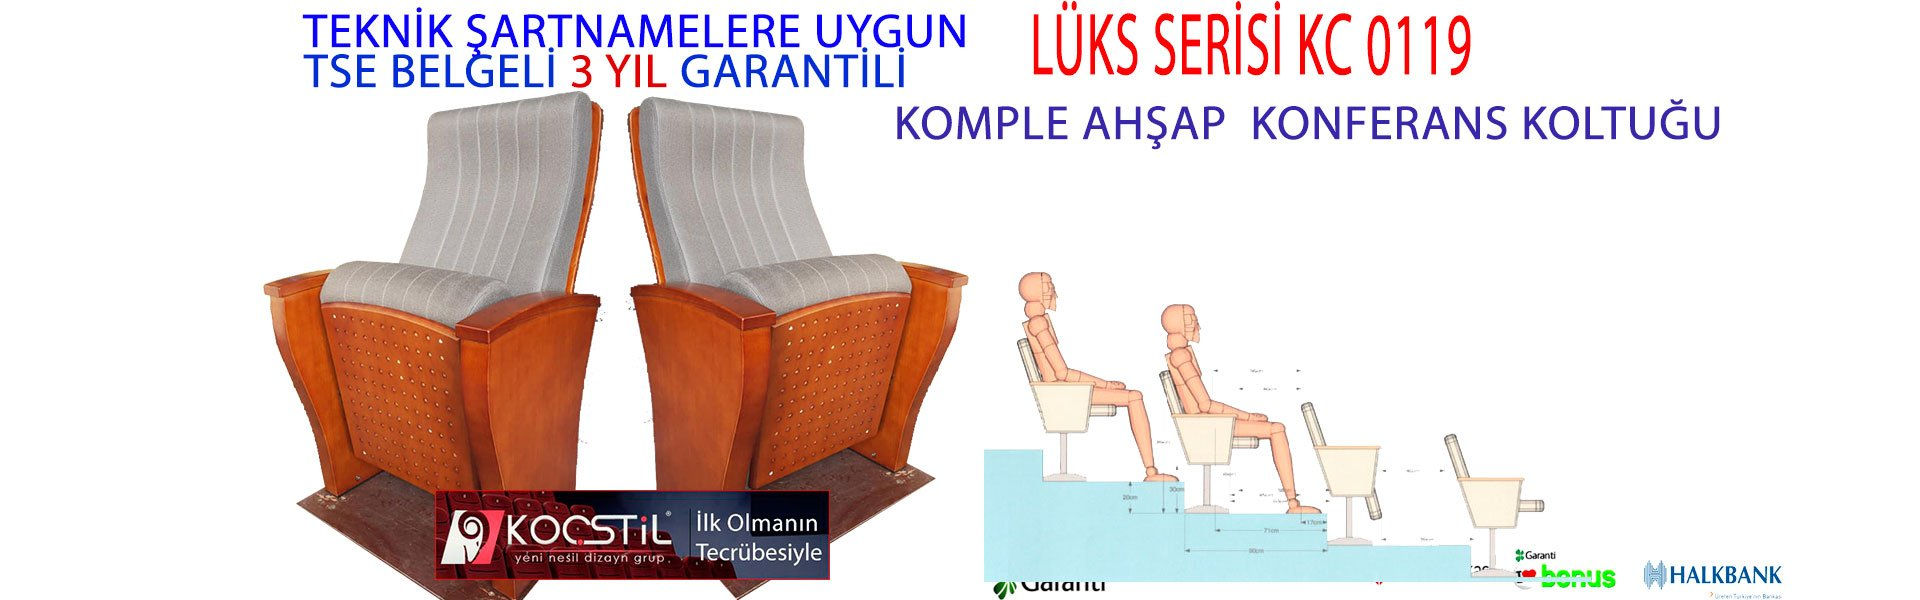 LÜKS SİNEMA VE KONFERANS KOLTUĞU